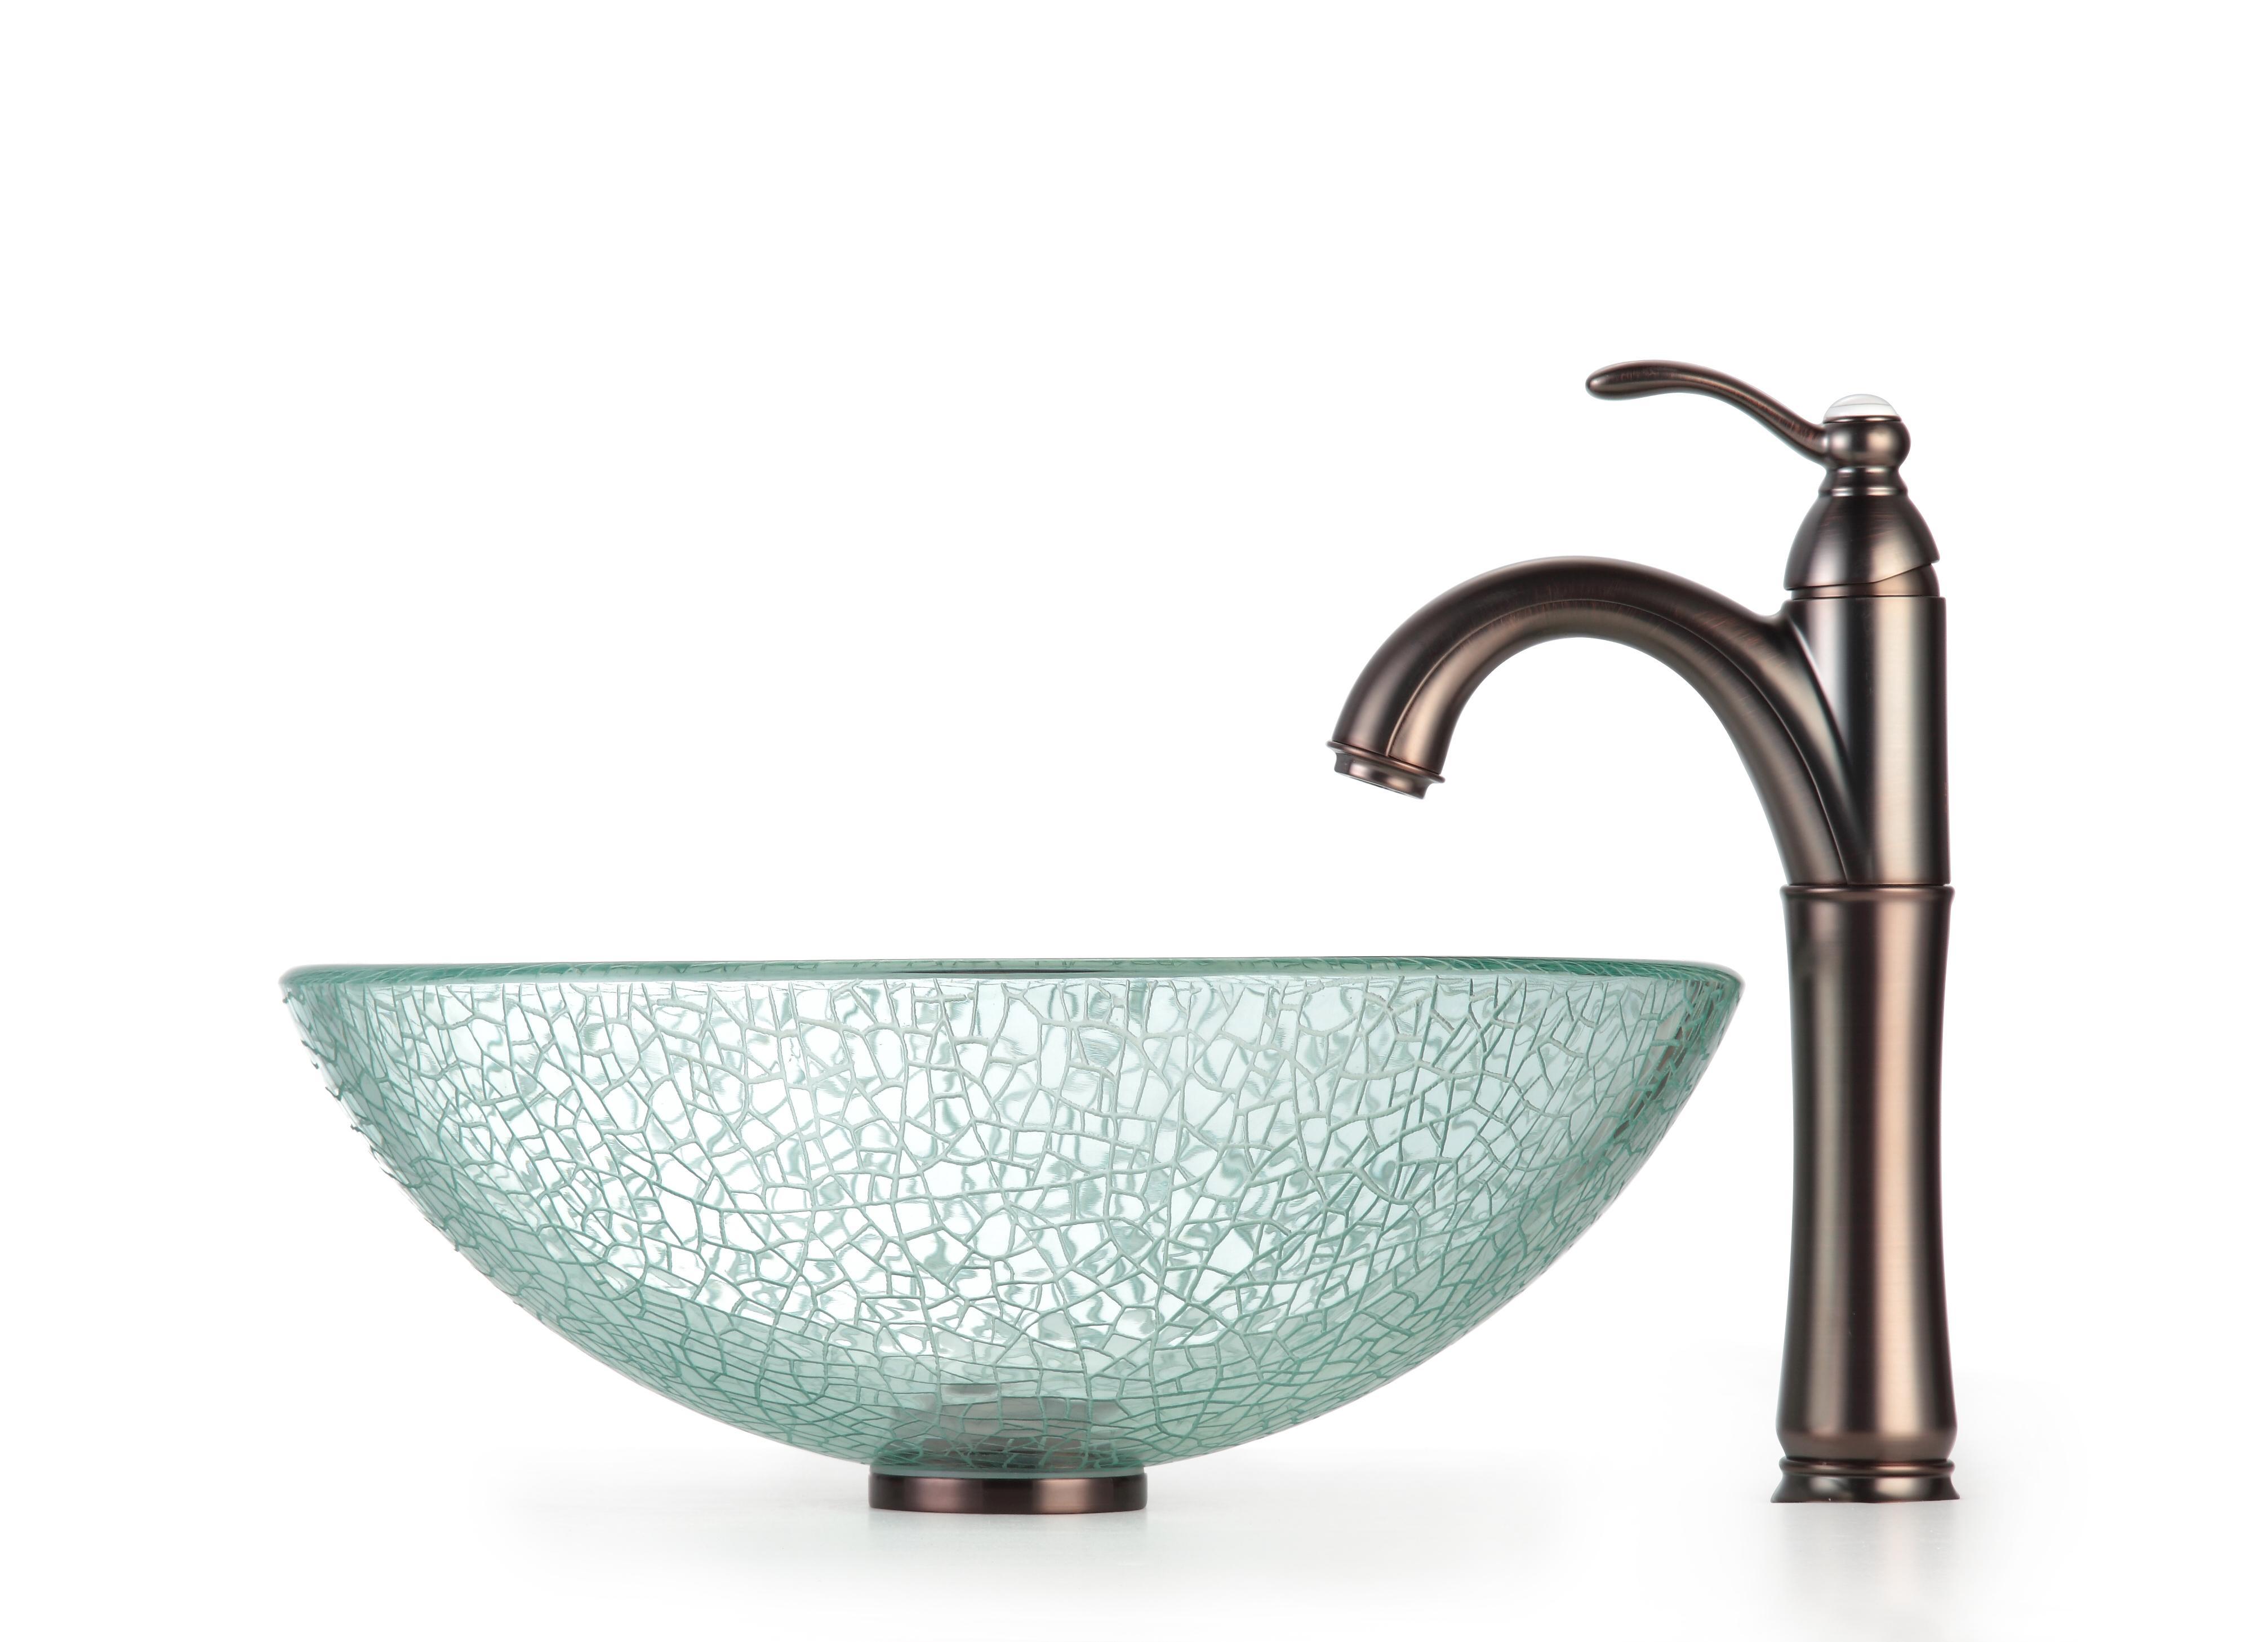 kraus bathroom combo set broken glass vessel sink rivera faucet free shipping today. Black Bedroom Furniture Sets. Home Design Ideas